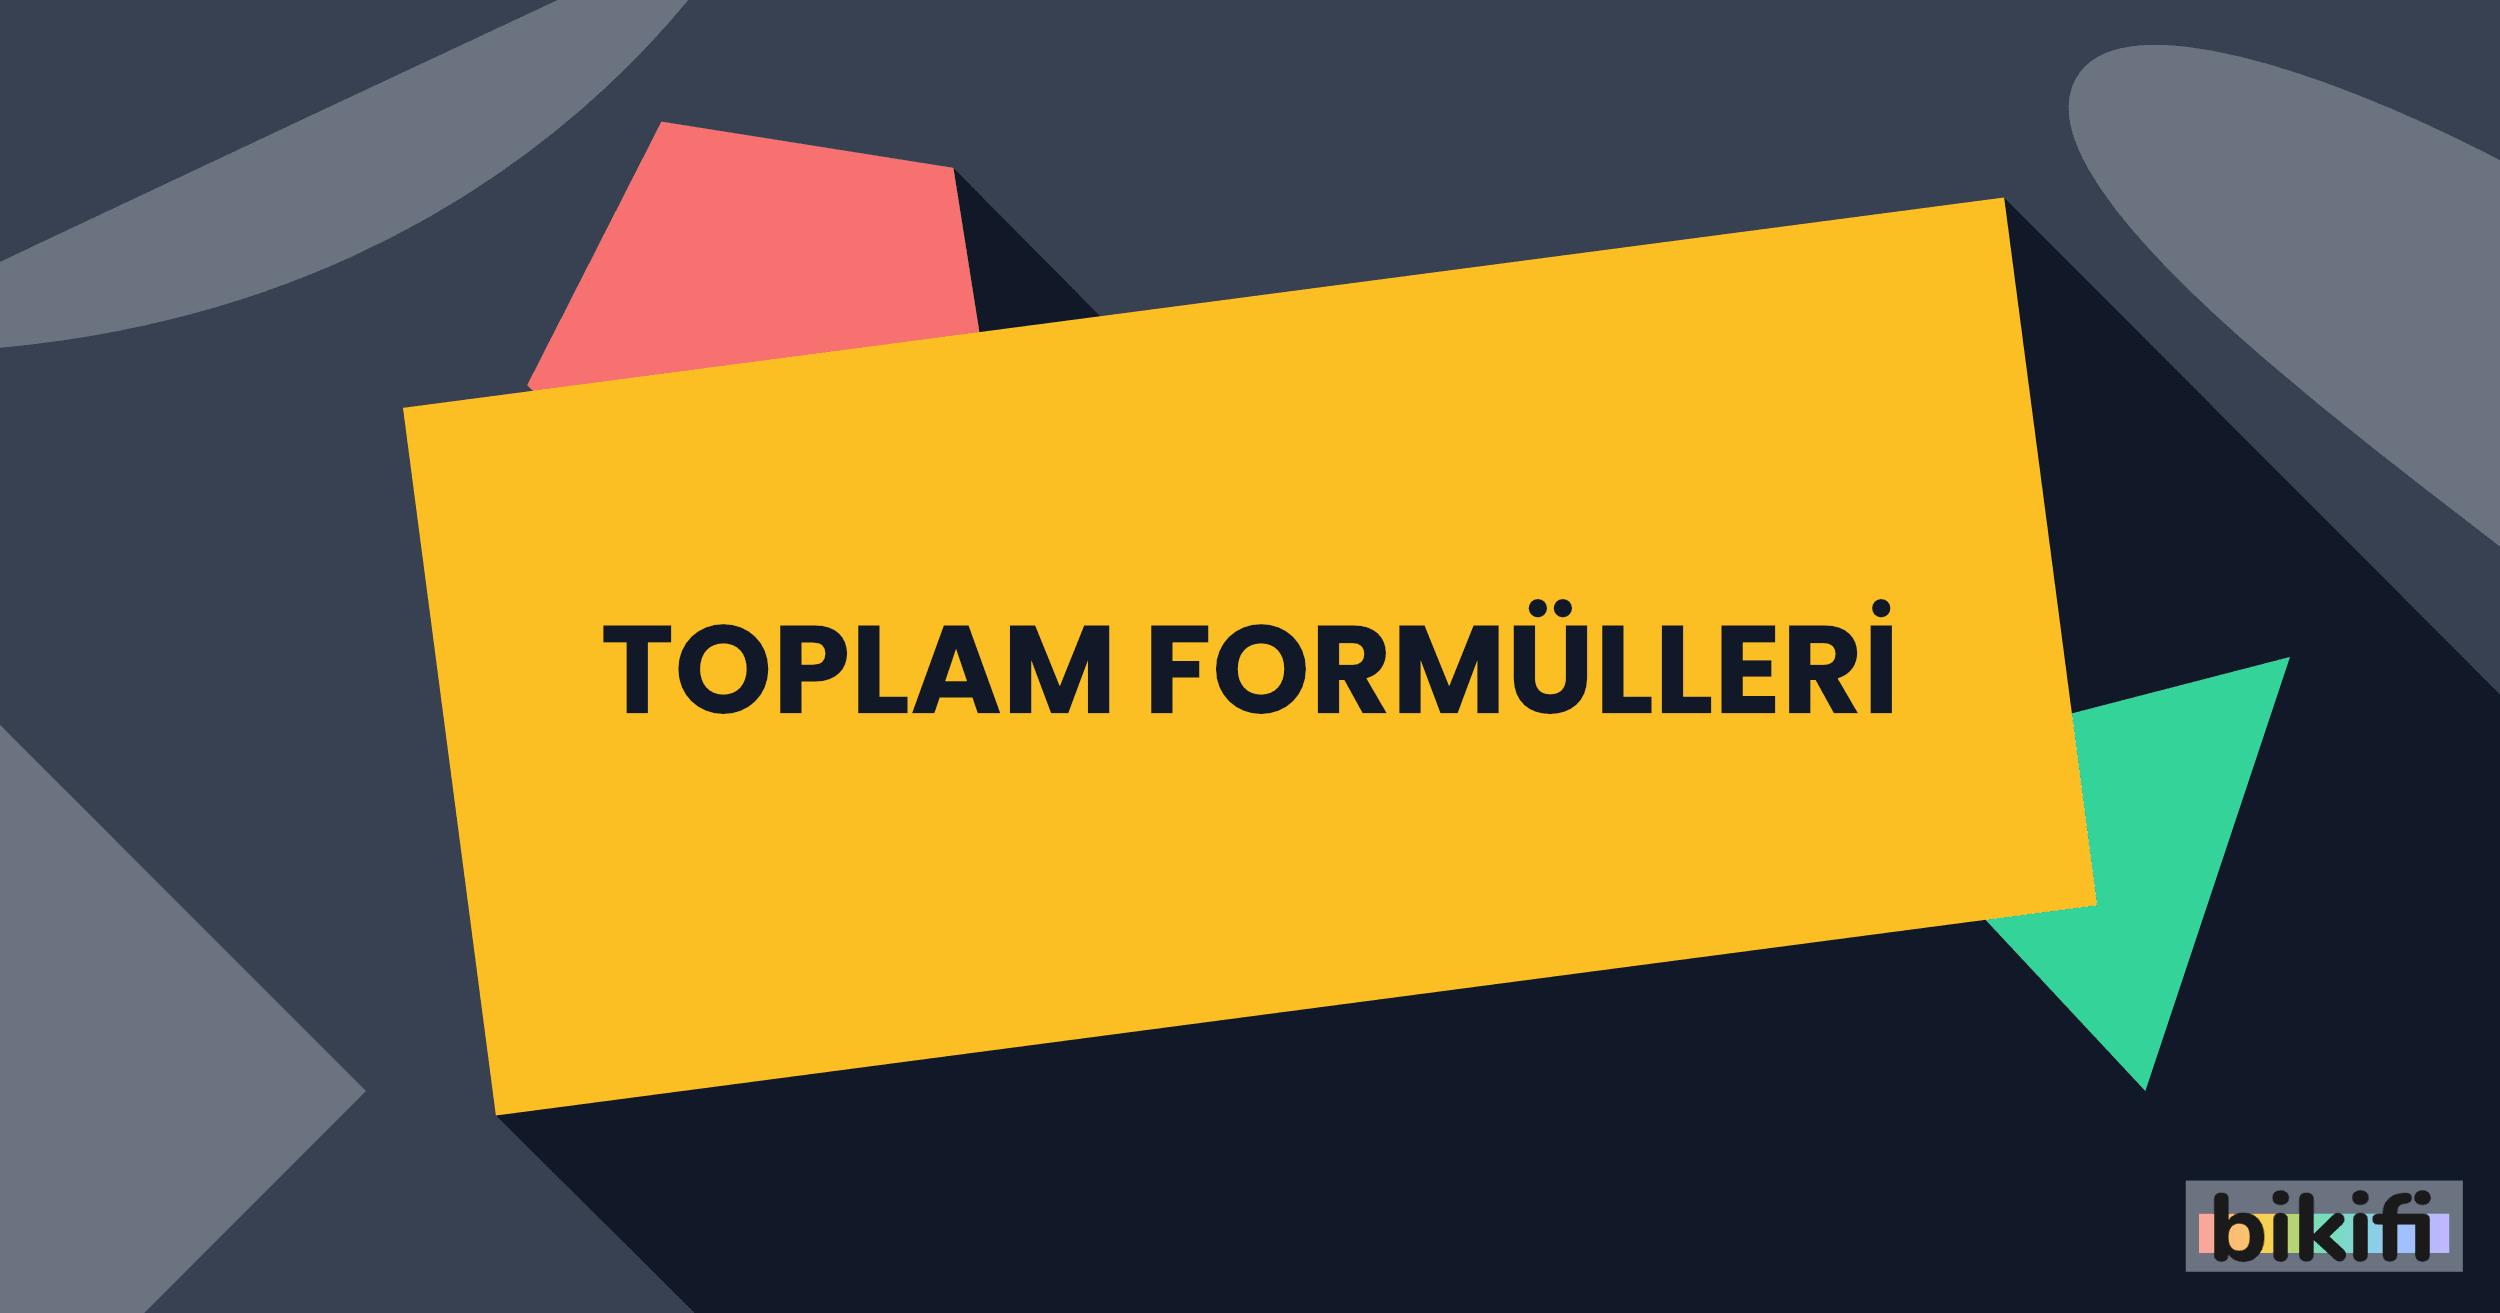 Toplam Formülleri